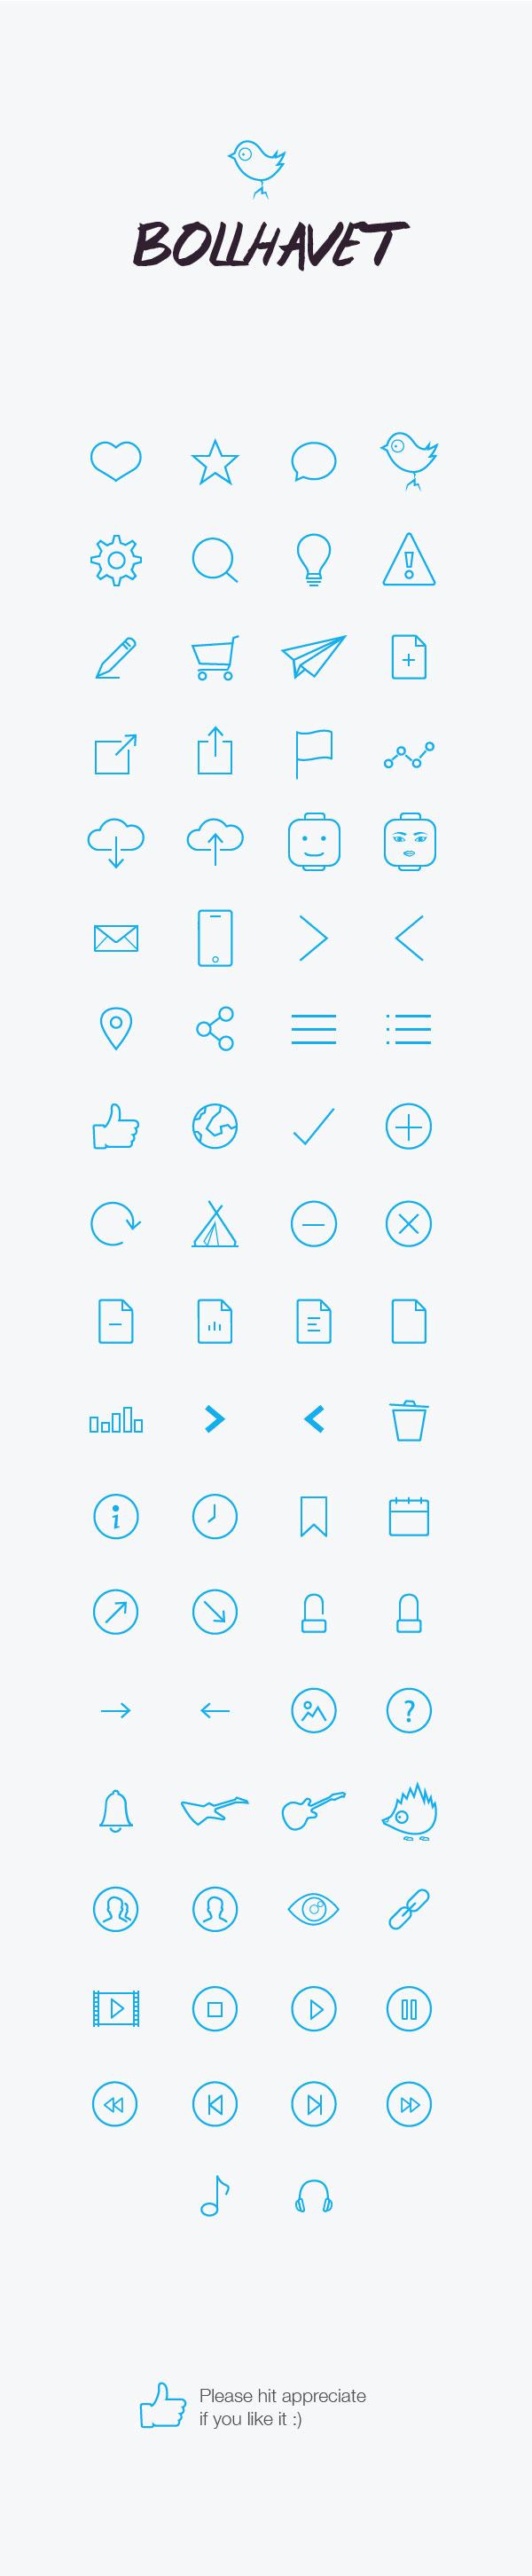 Bollhavet 74 Free Flat Icon v2